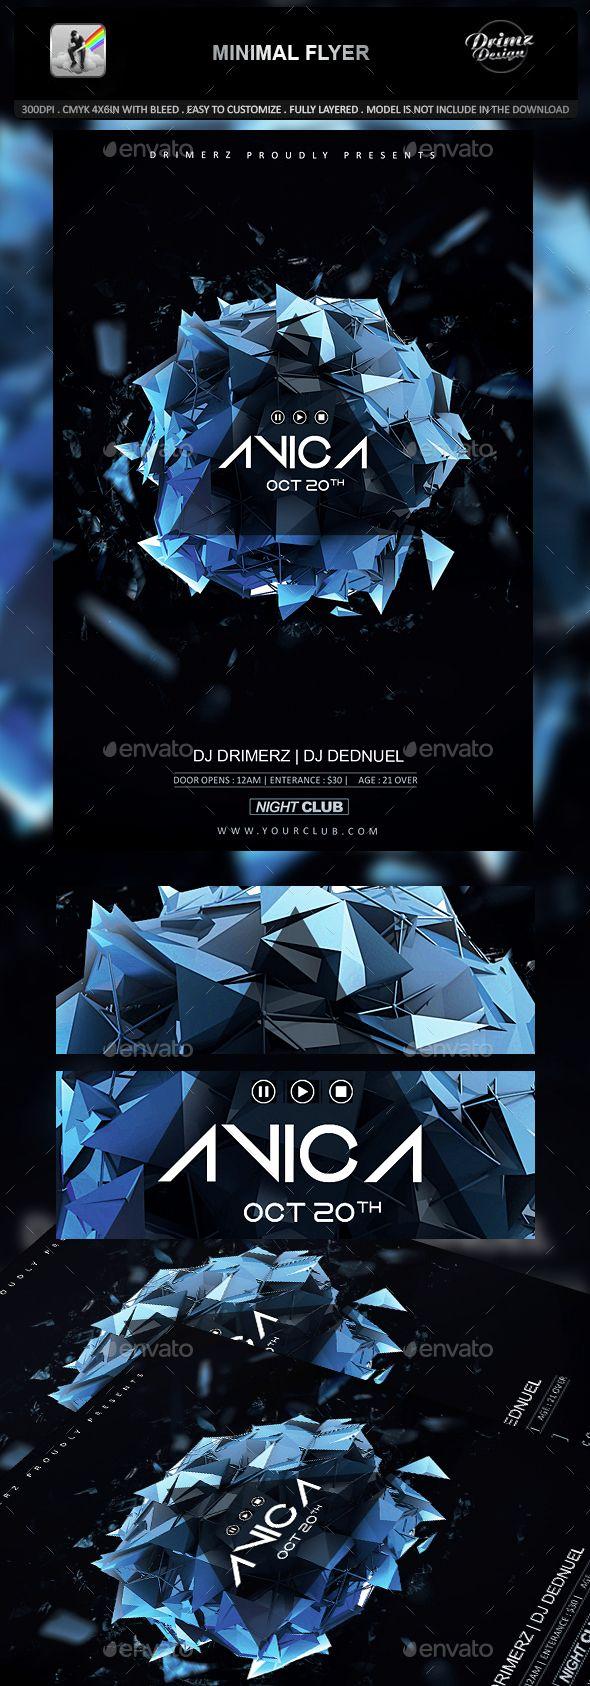 Minimal Flyer  #exploding #flyer #glowing #minimal #minimal flyer #music #night …